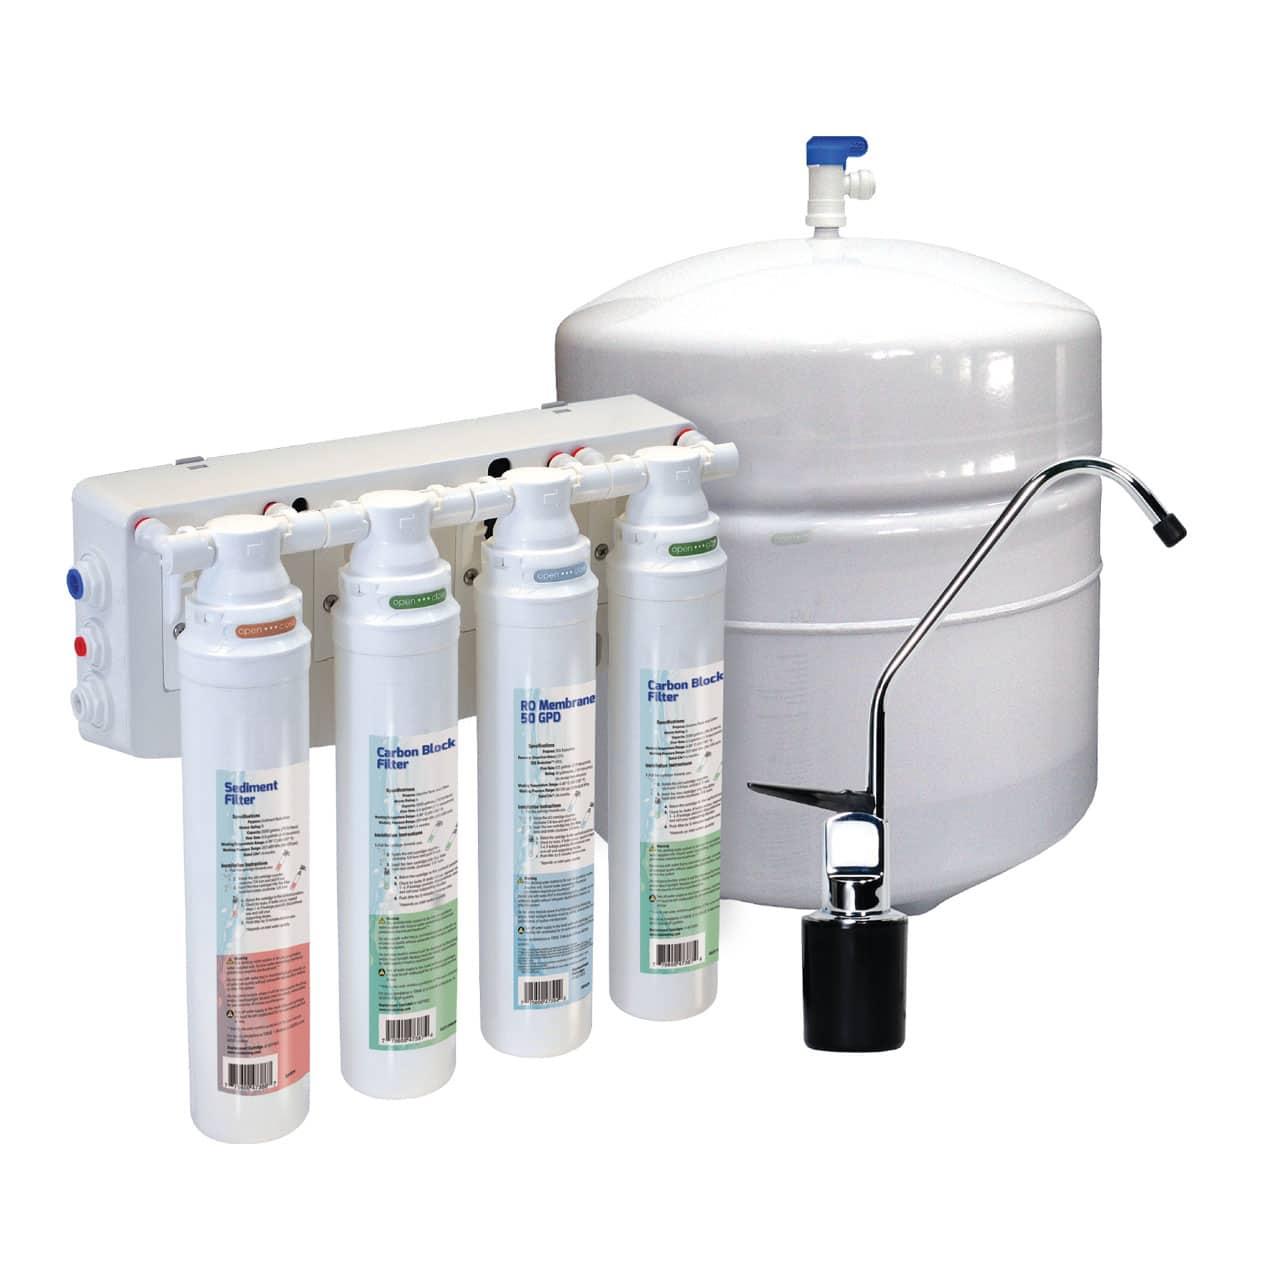 Aquafly QCRO Reverse Osmosis